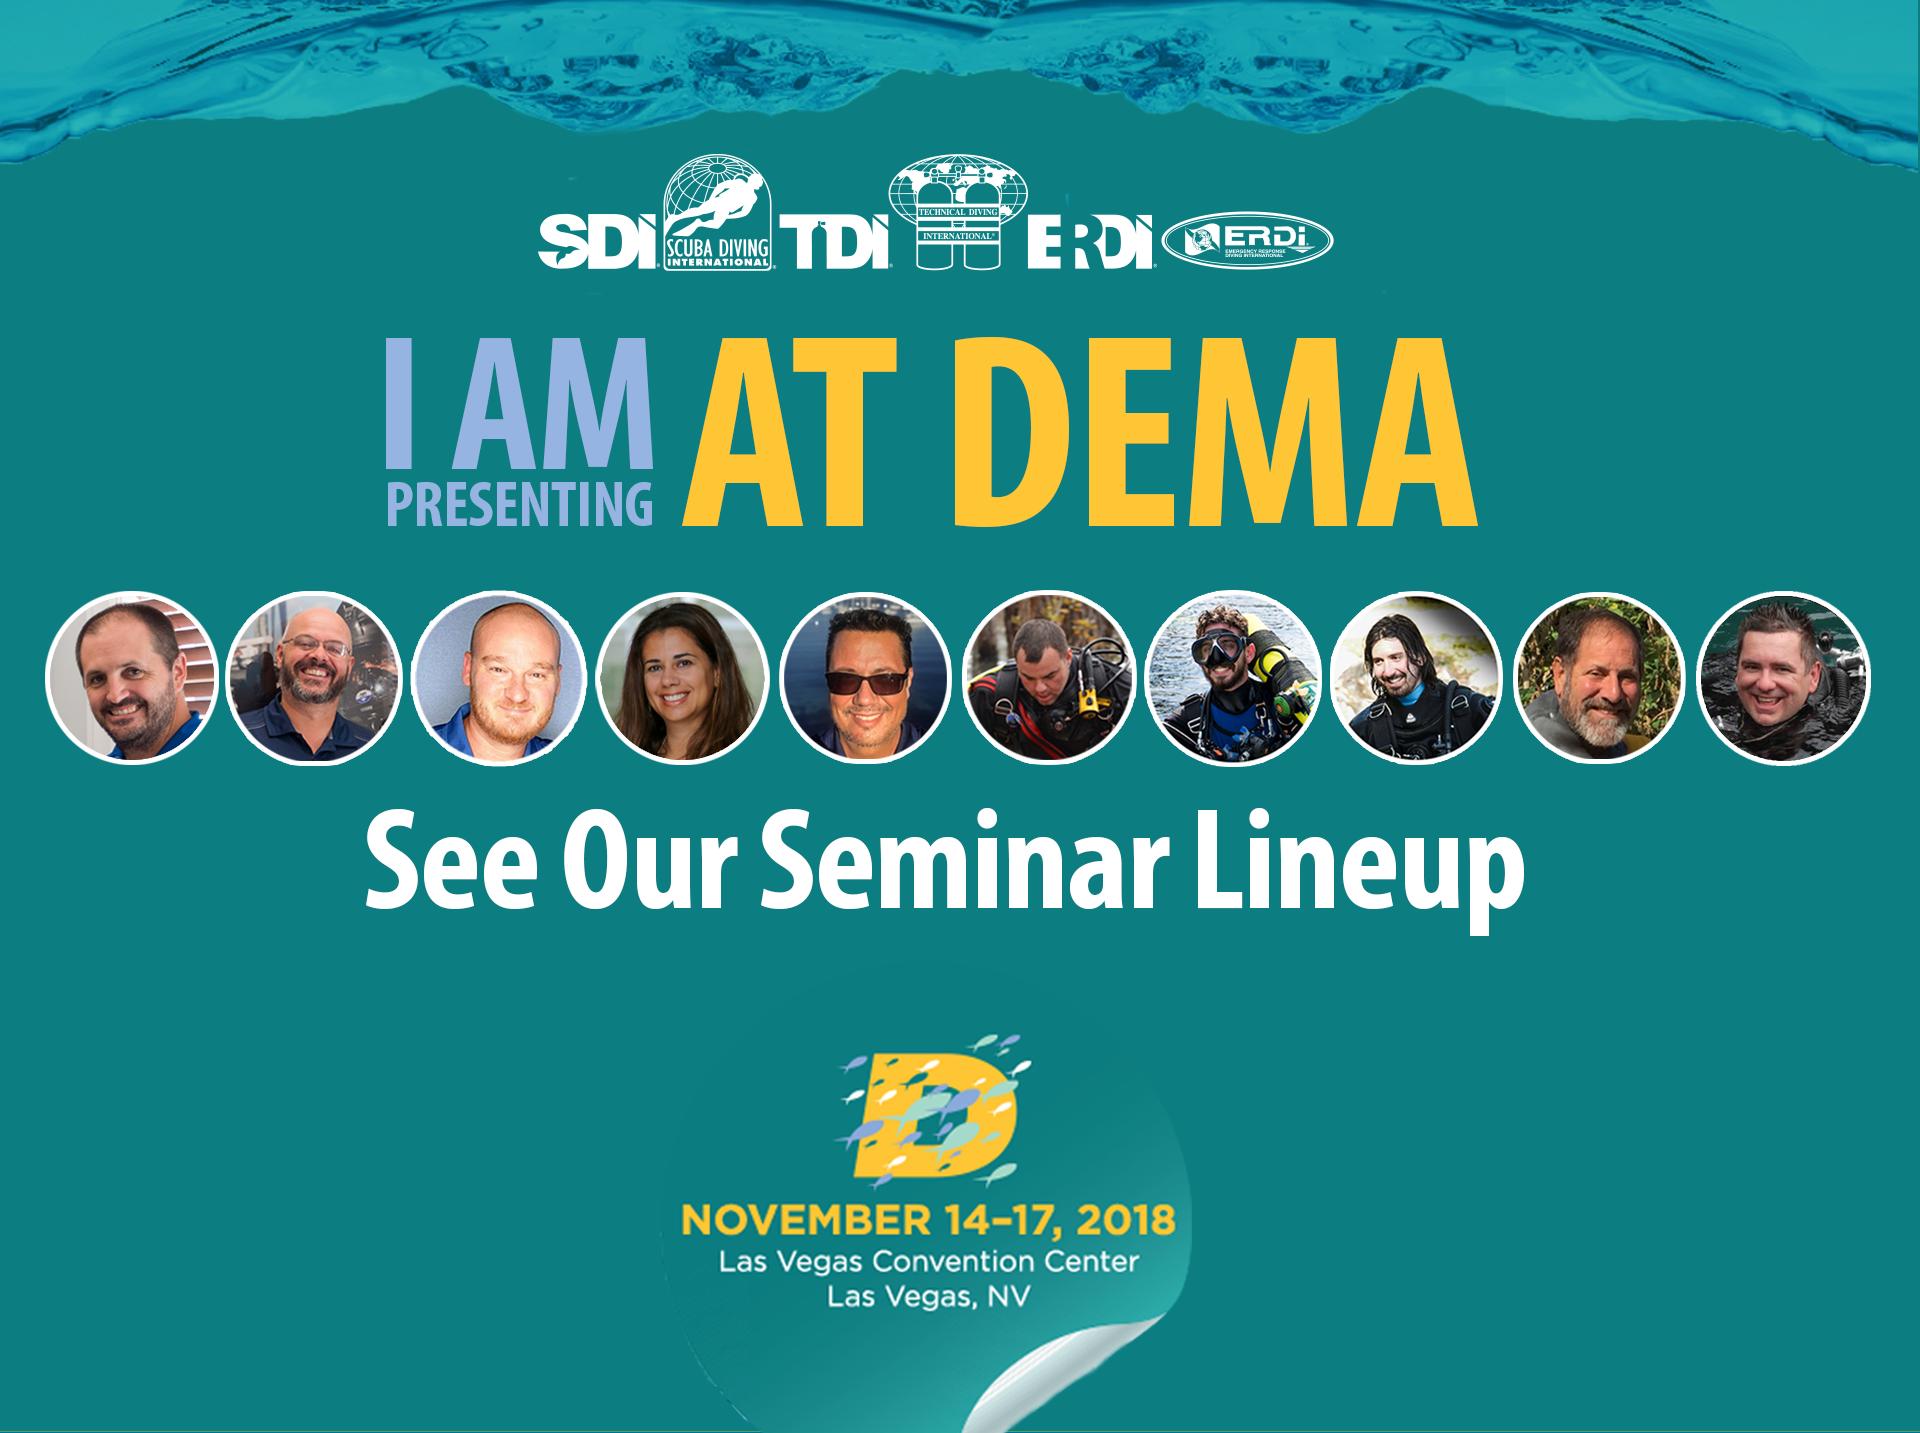 Dema Seminars 2018